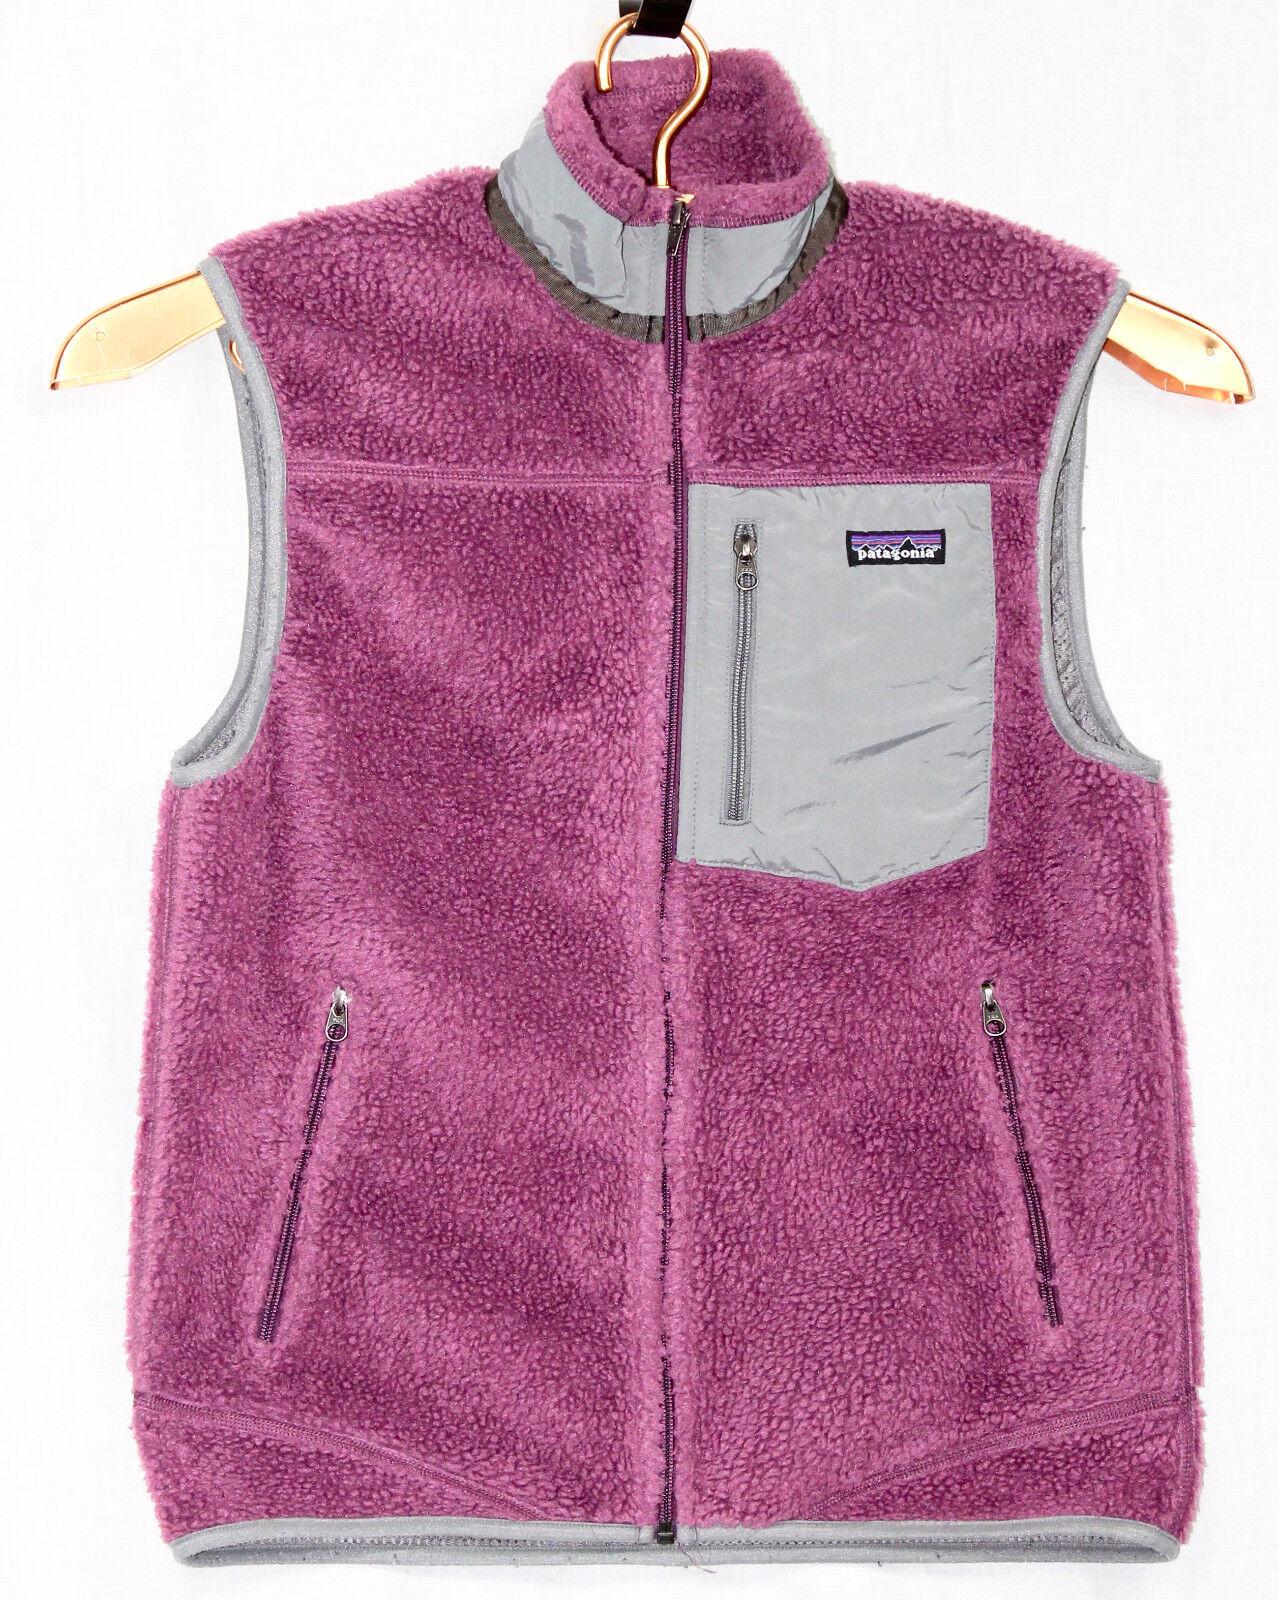 PATAGONIA Uomo's Medium Classic Retro-X Sherpa Deep Pile Sherpa Retro-X Fleece Zip Vest viola 2a8615